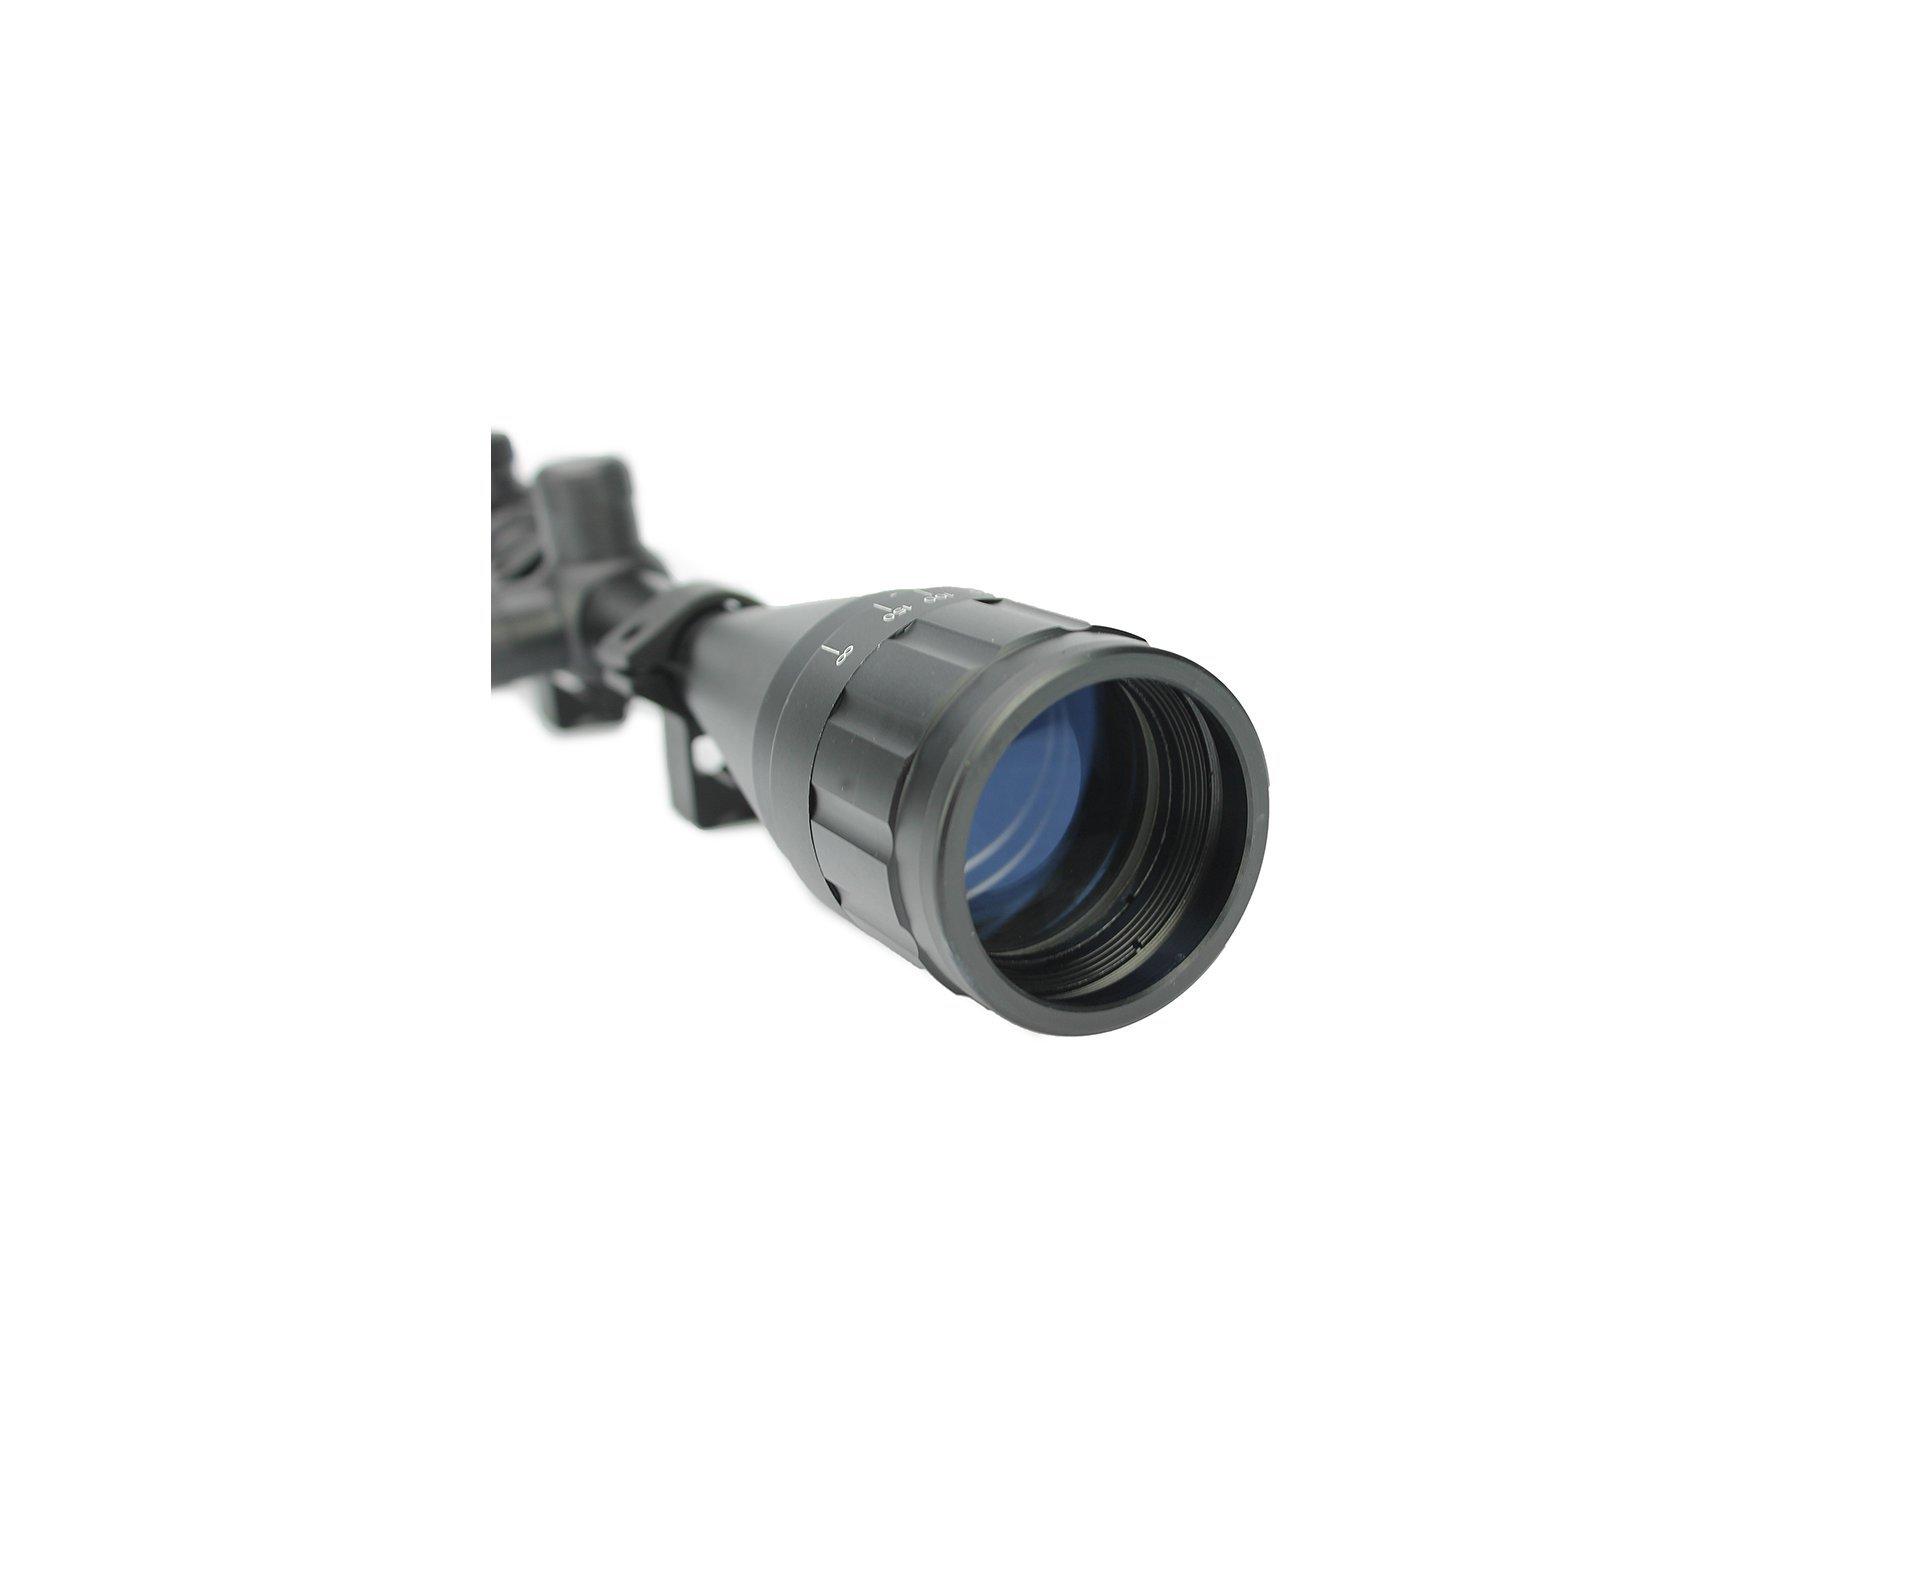 Luneta 3-9x40 Aoe Mil Dot E Paralax Mount 11mm Spa Artemis - Fxr